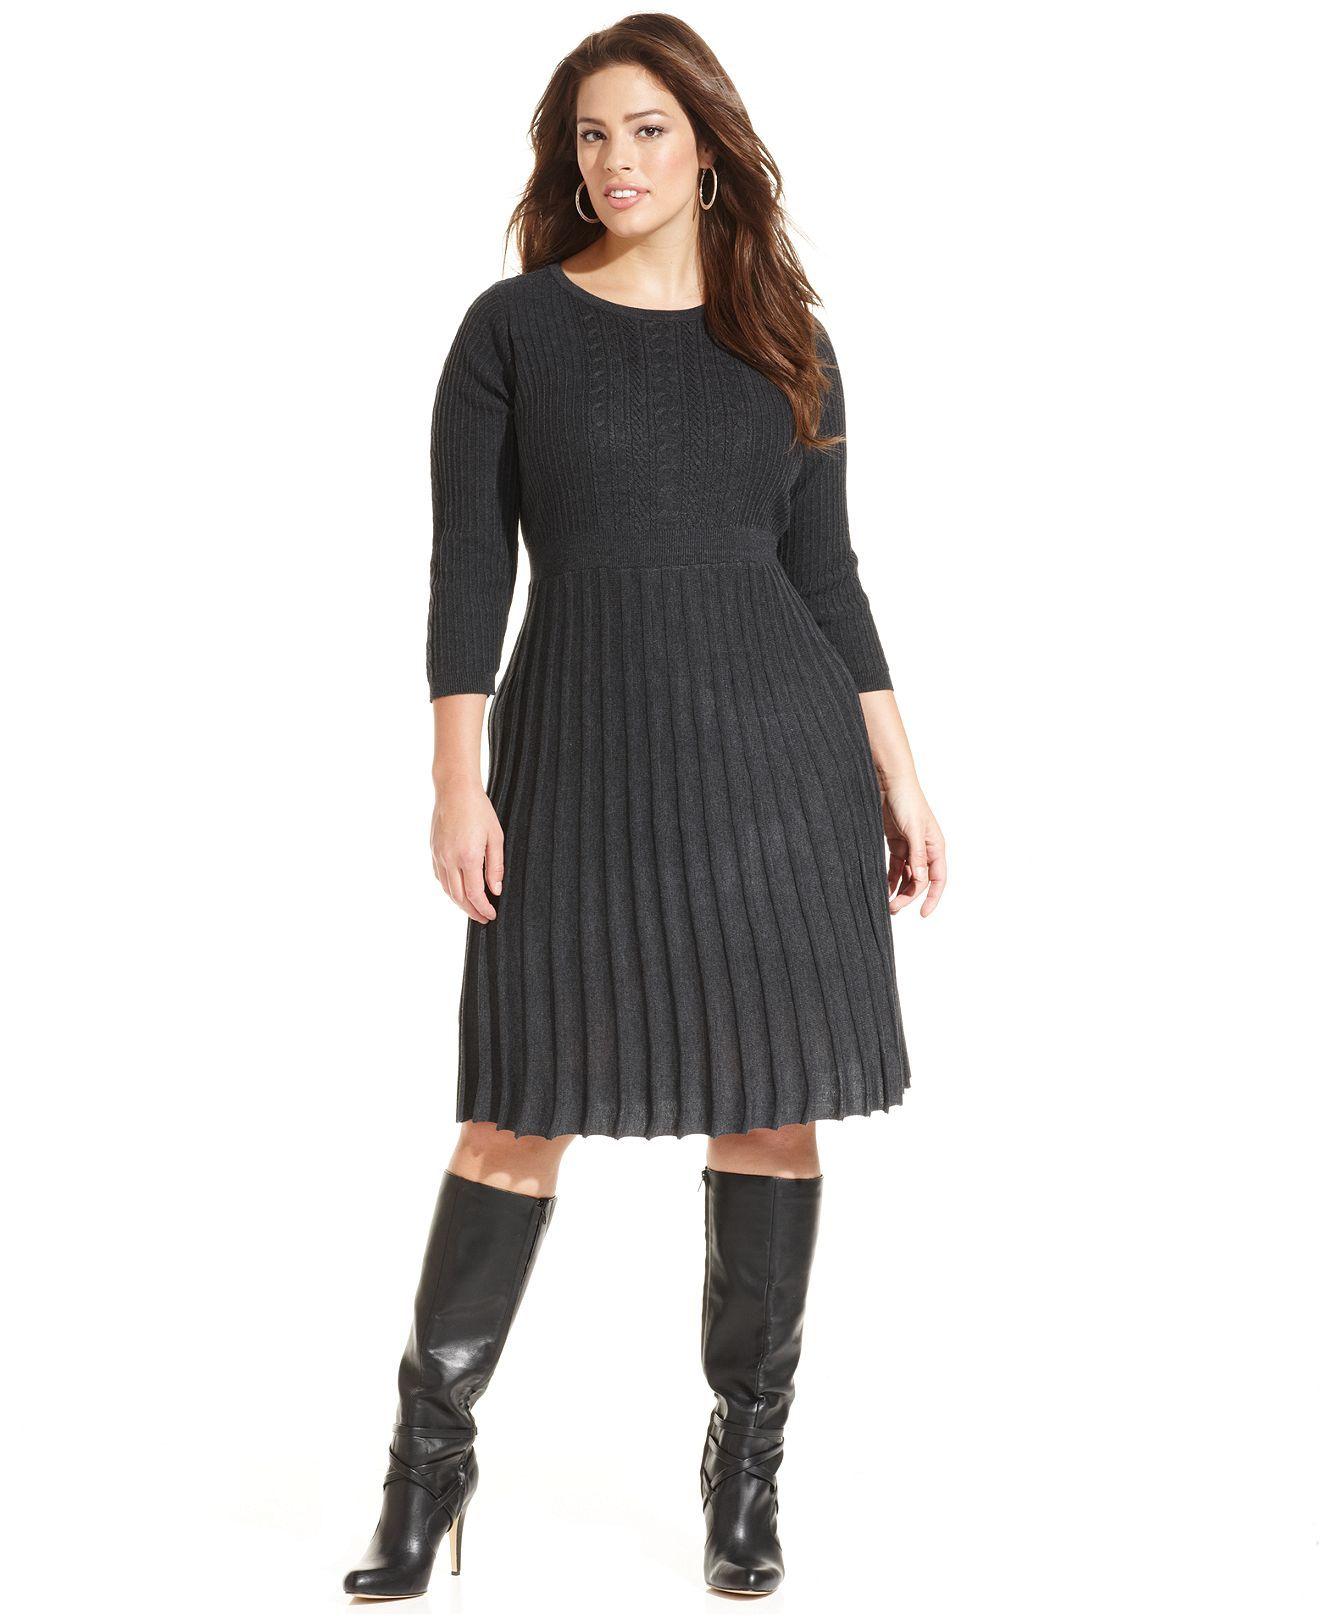 32+ Plus size sweater dress ideas